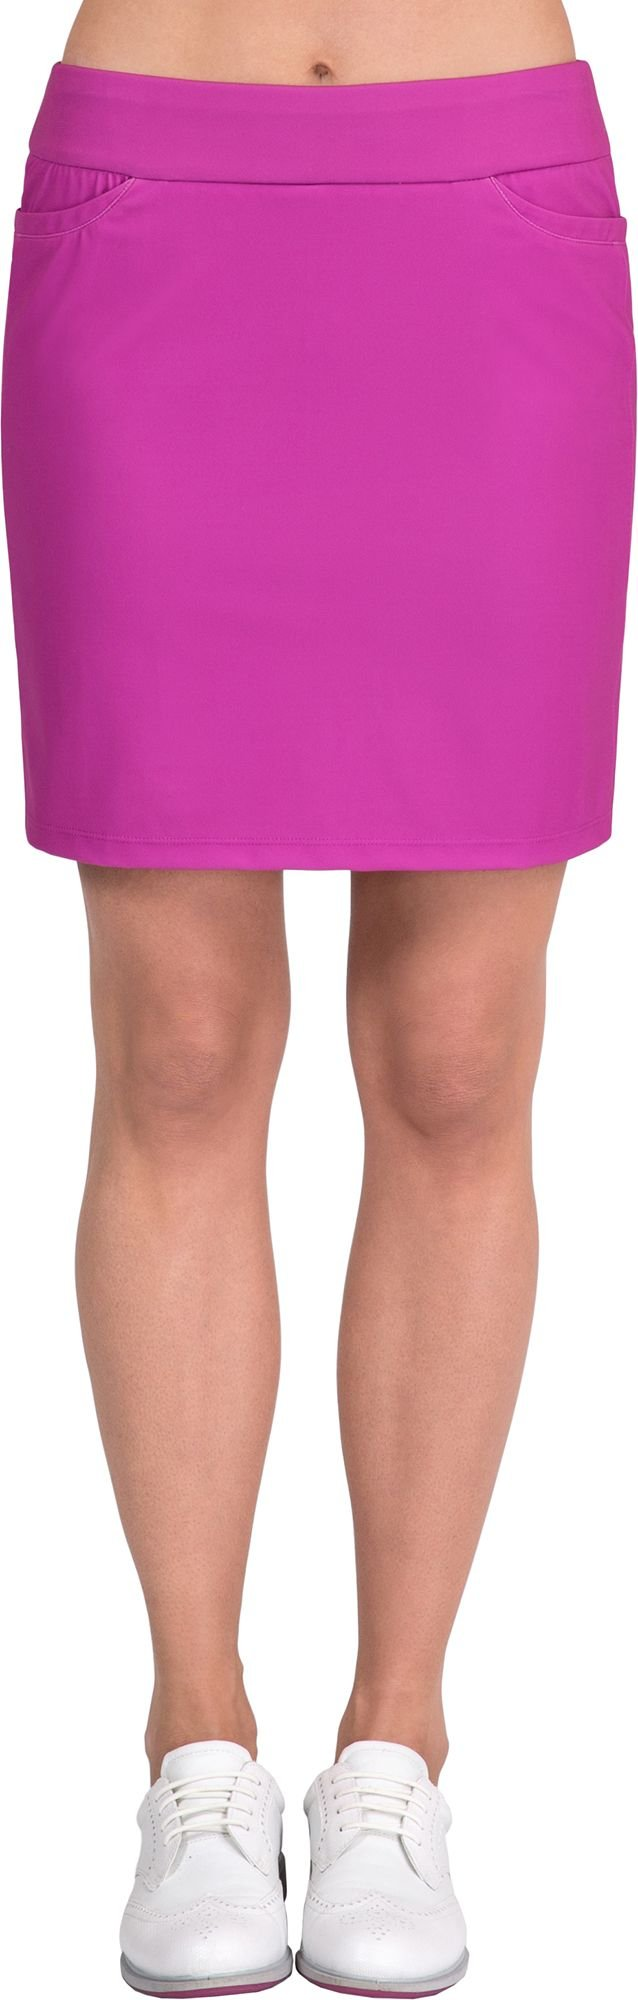 Tail Women's Comfort Knit Flounce Golf Skort (Vibrance, XS)